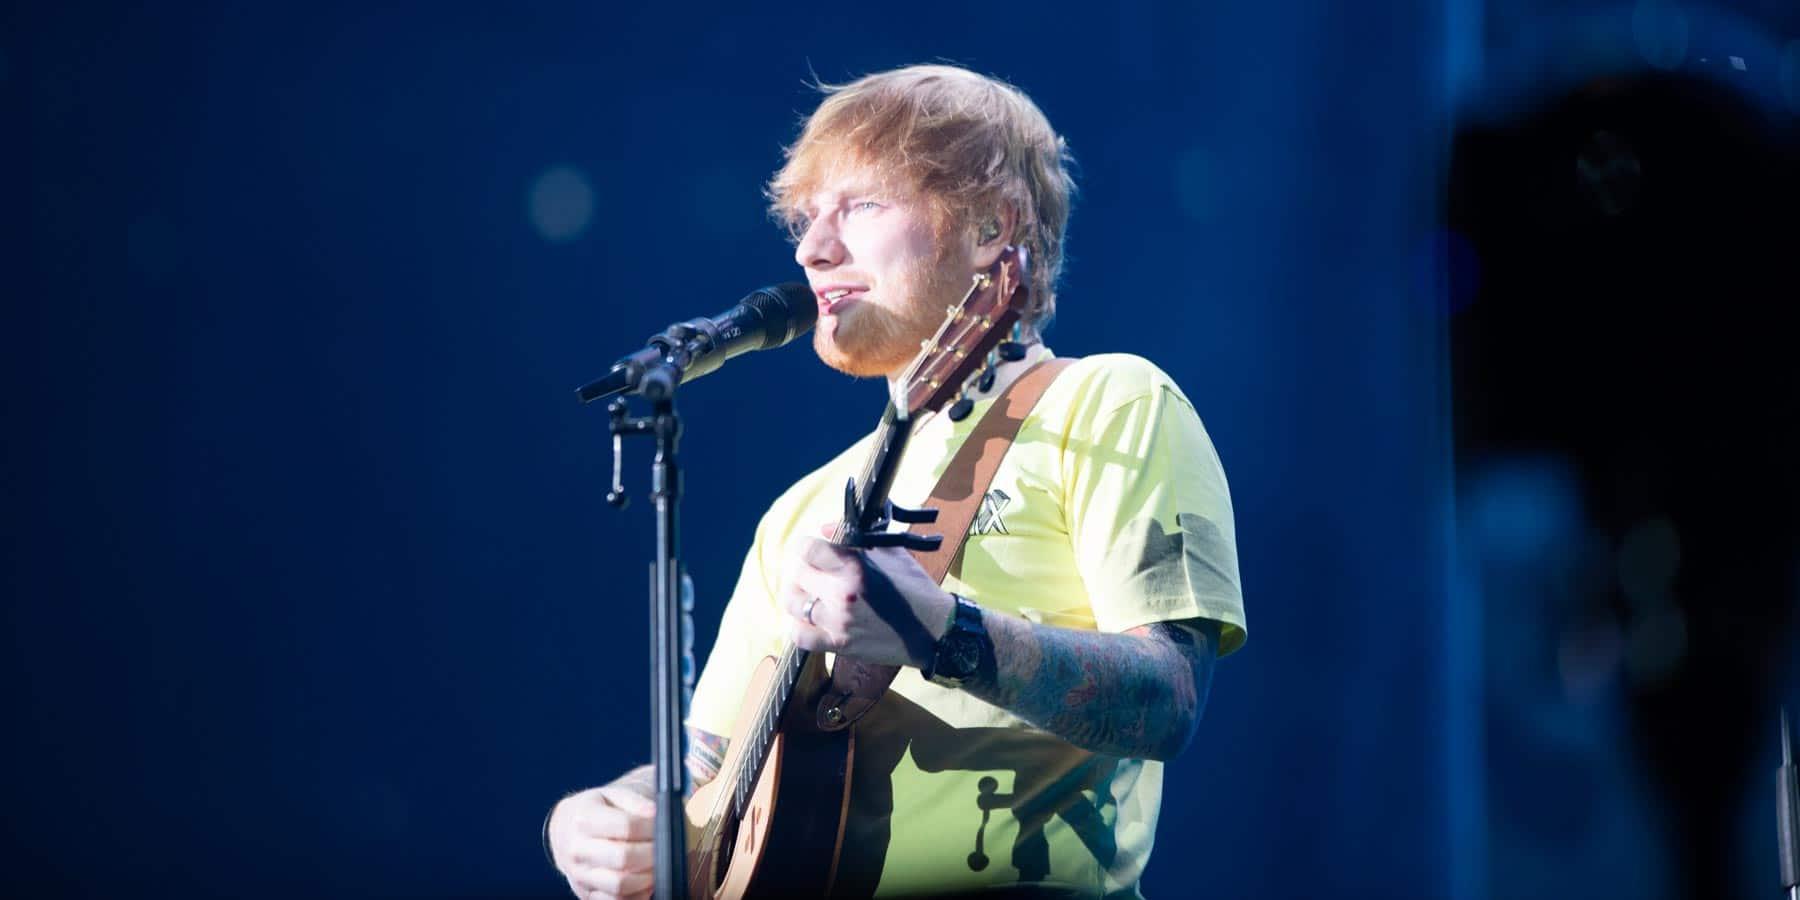 Ed Sheeran North American Stadium Tour 2018 - U.S. Bank Stadium Minneapolis Minnesota - October 20th 2018 - Snow Patrol Lauv